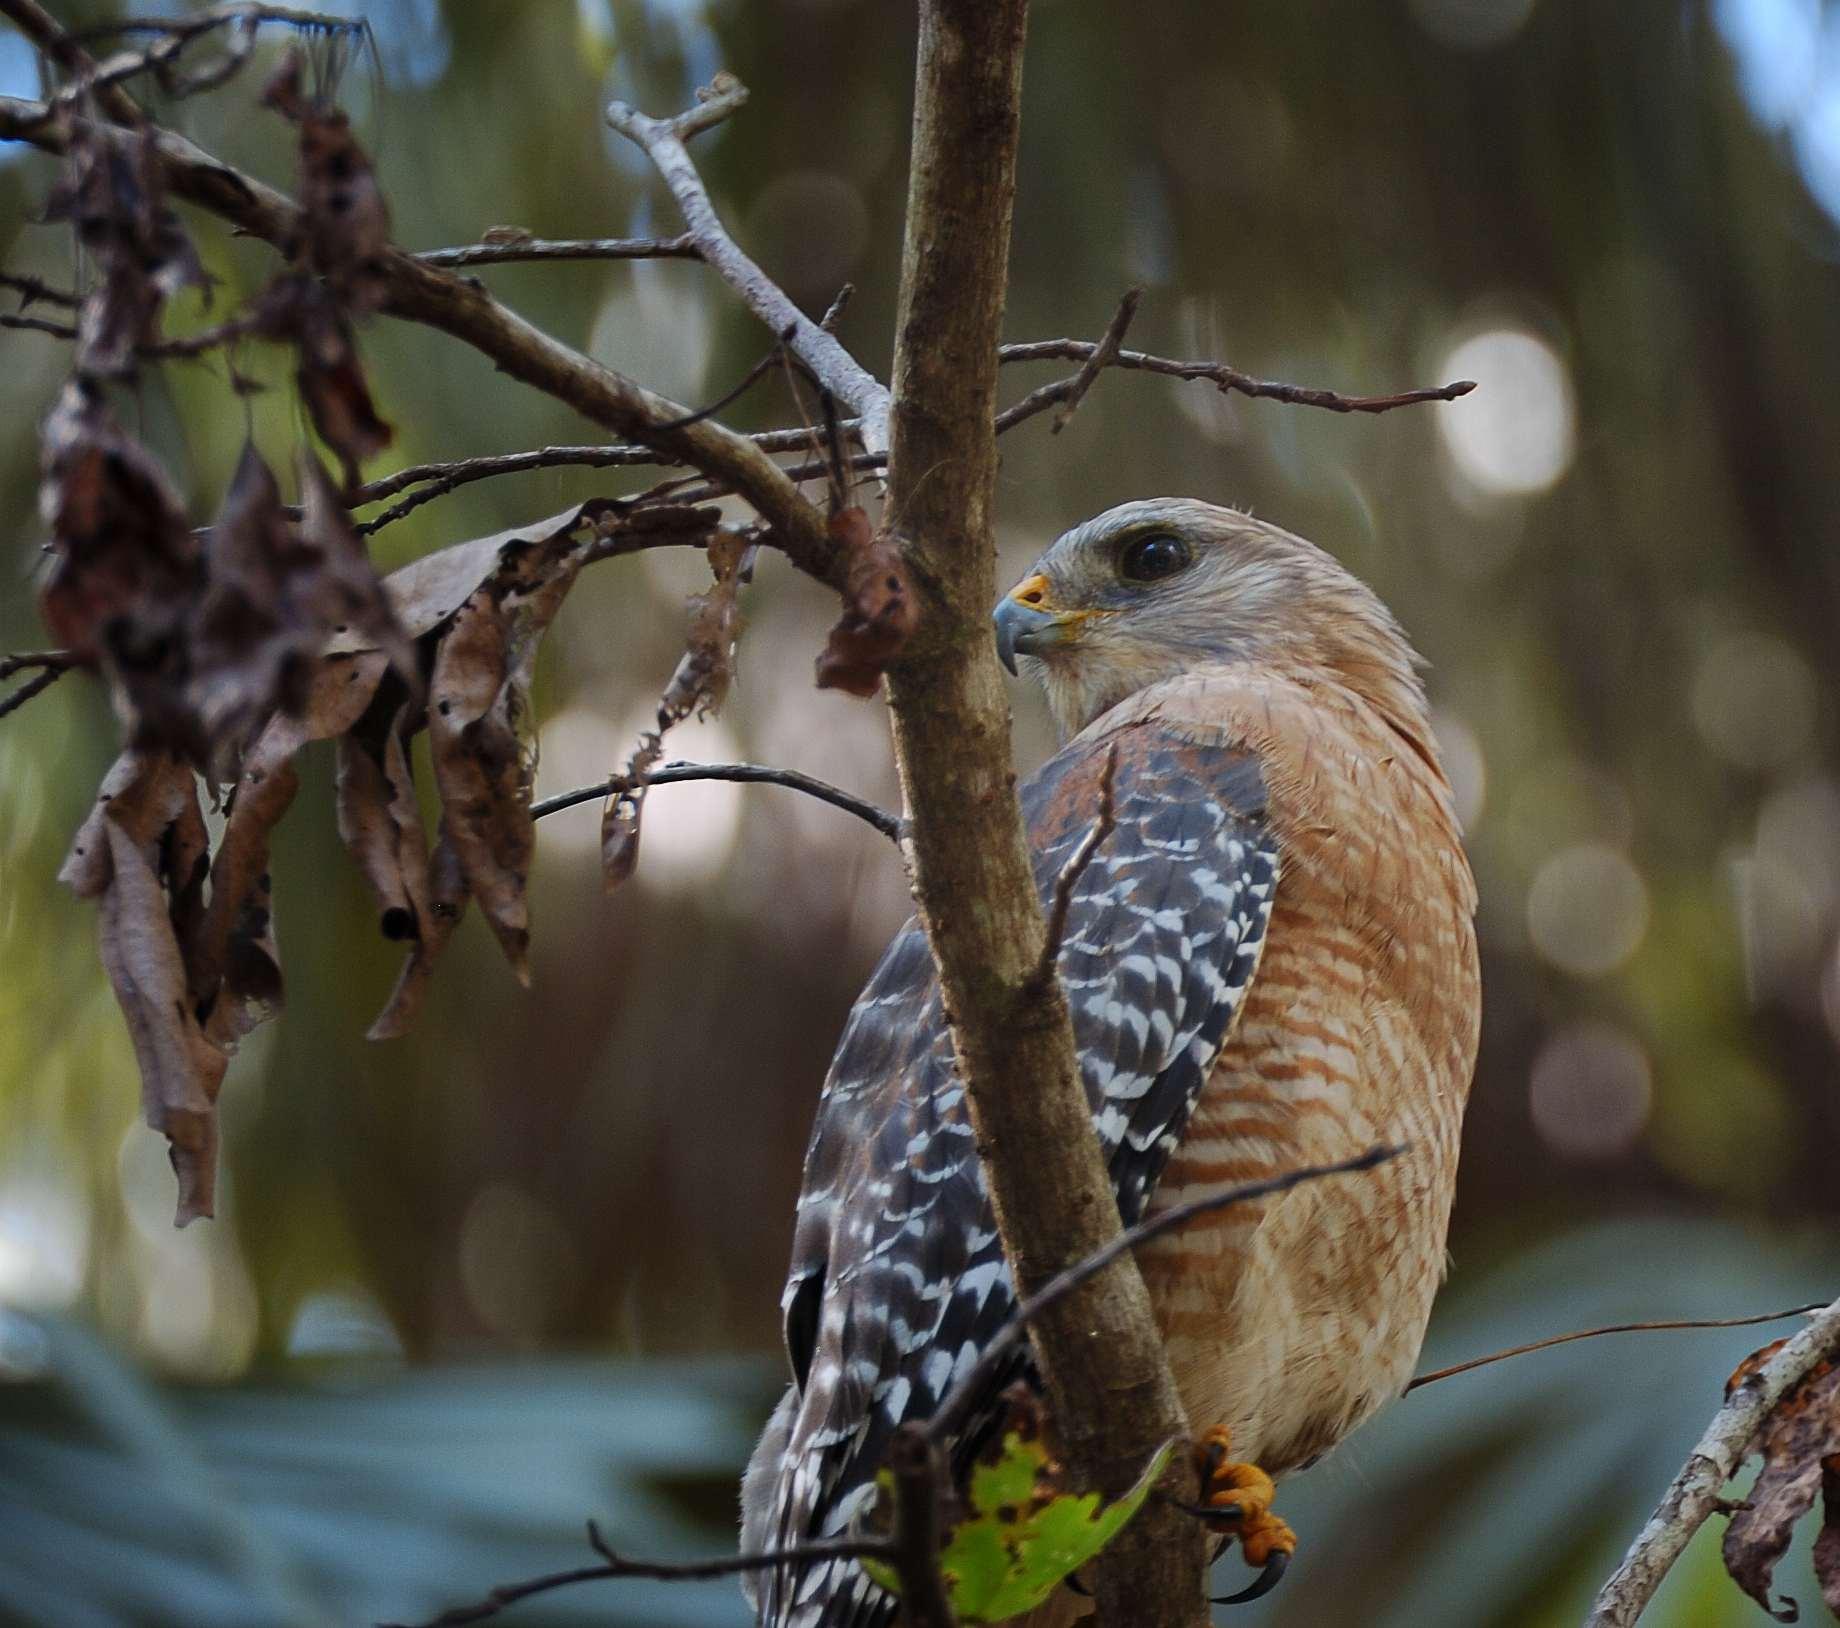 Red-shouldered Hawk (Buteo lineatus) Highlands Hammock SPk by Dan